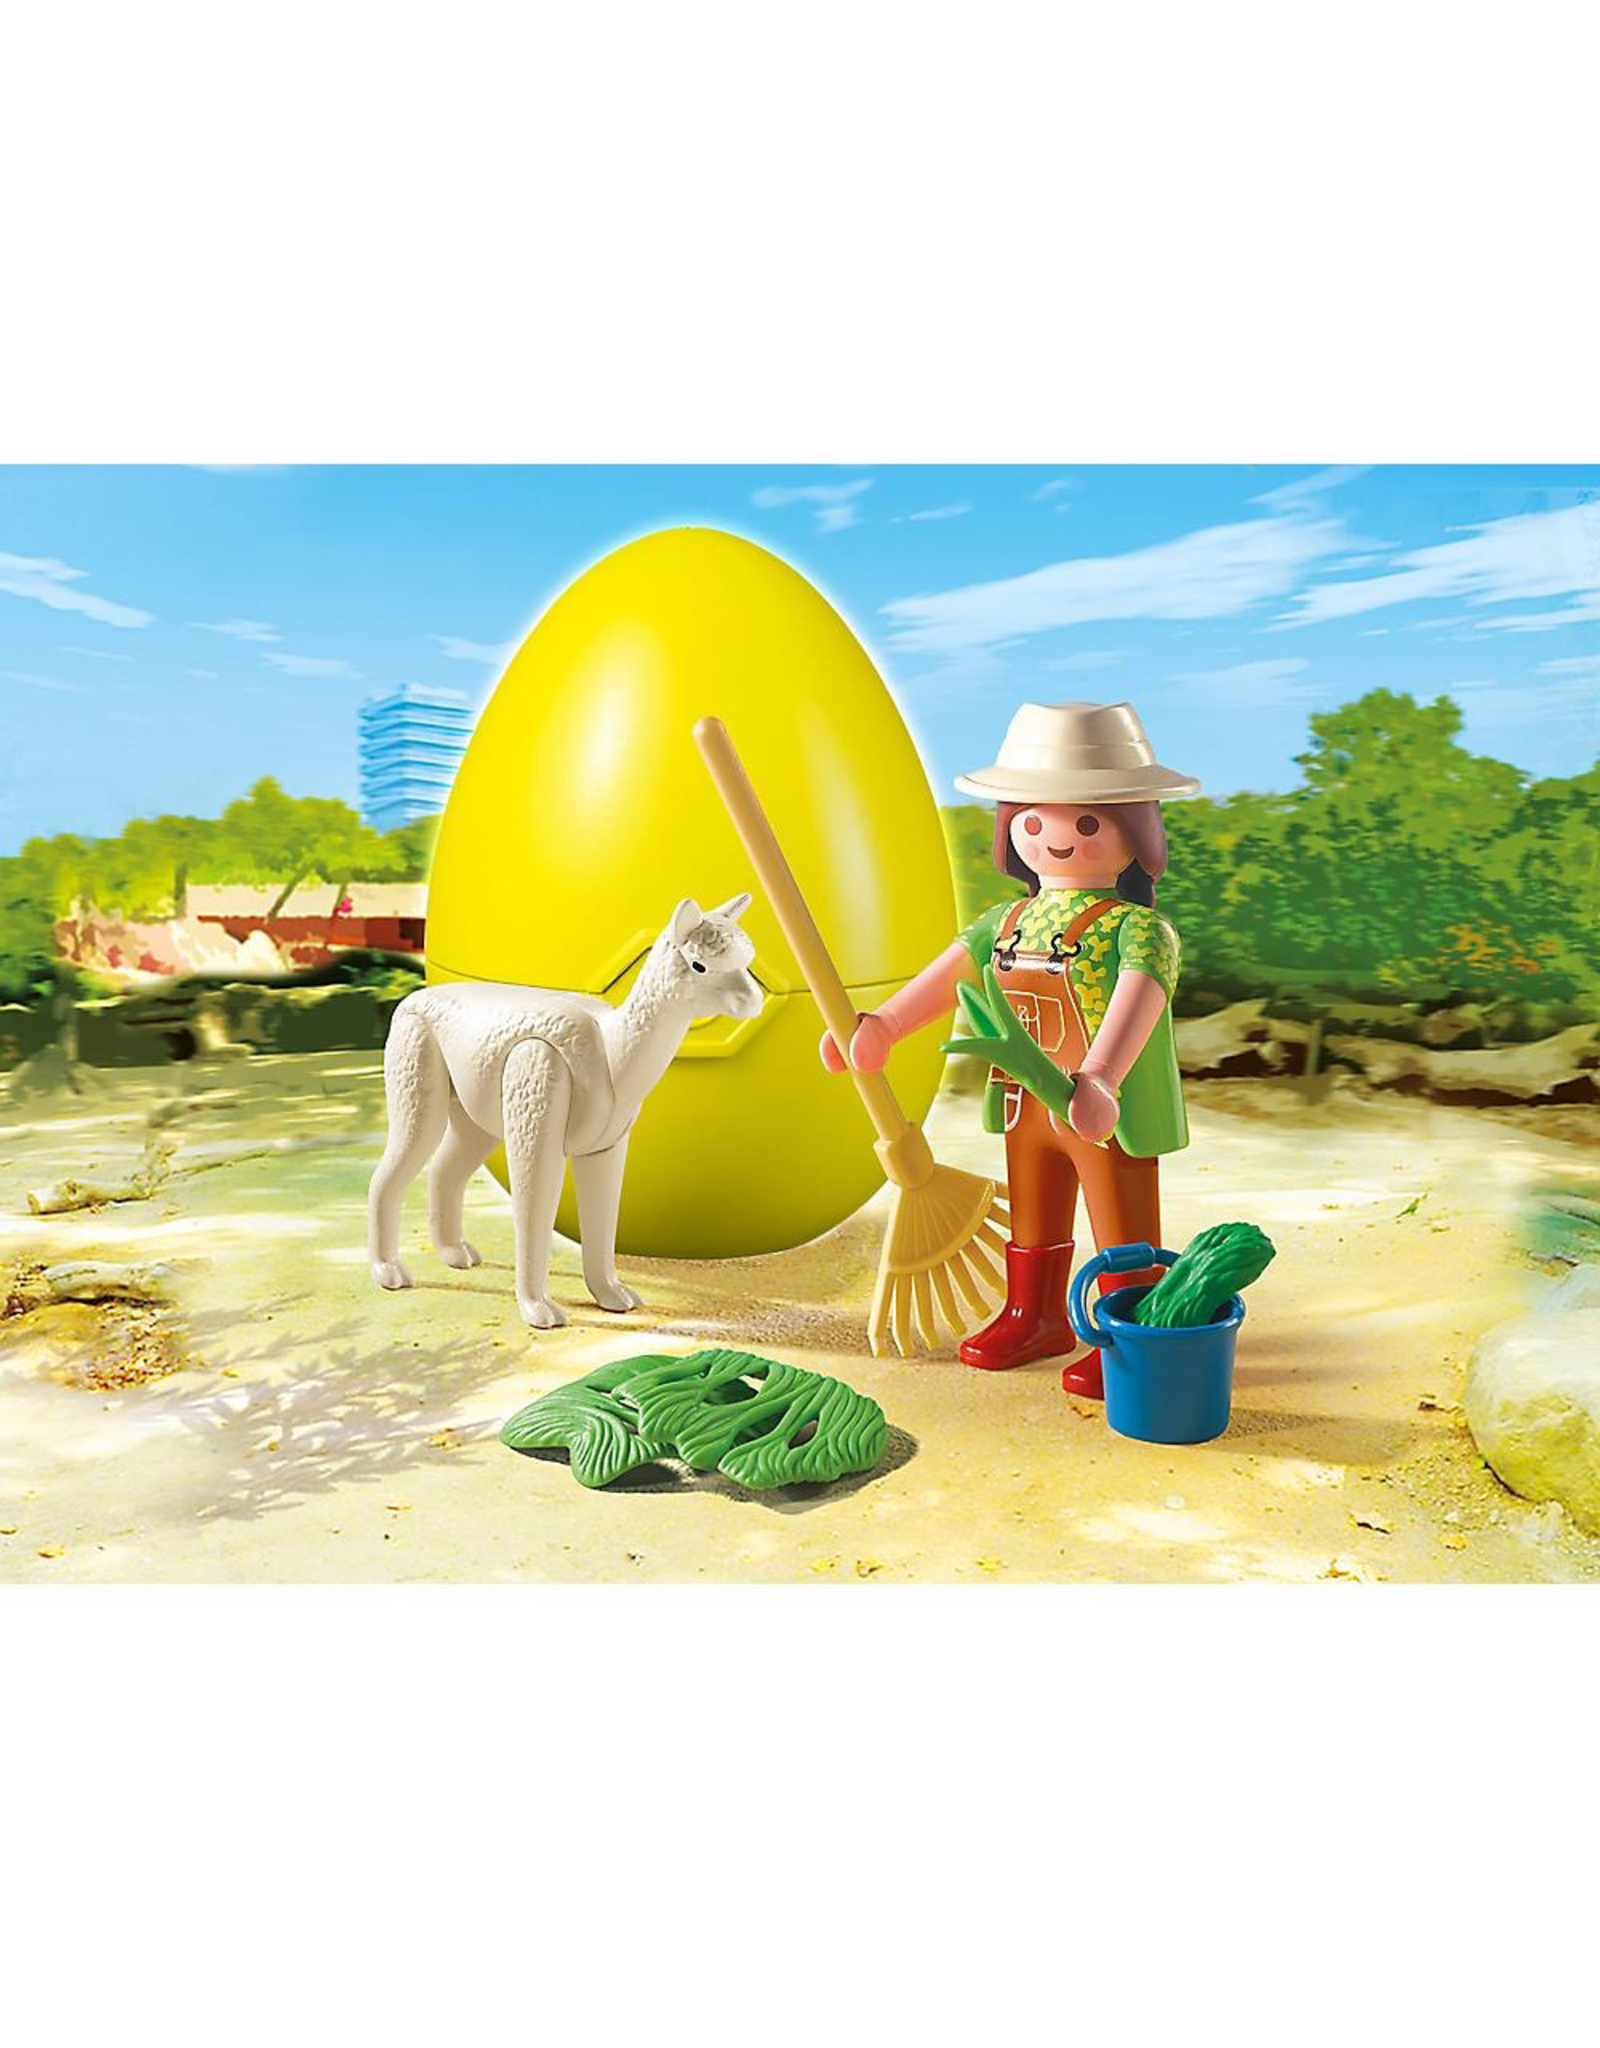 Playmobil 4944 ZOOKEEPER WITH ALPACA